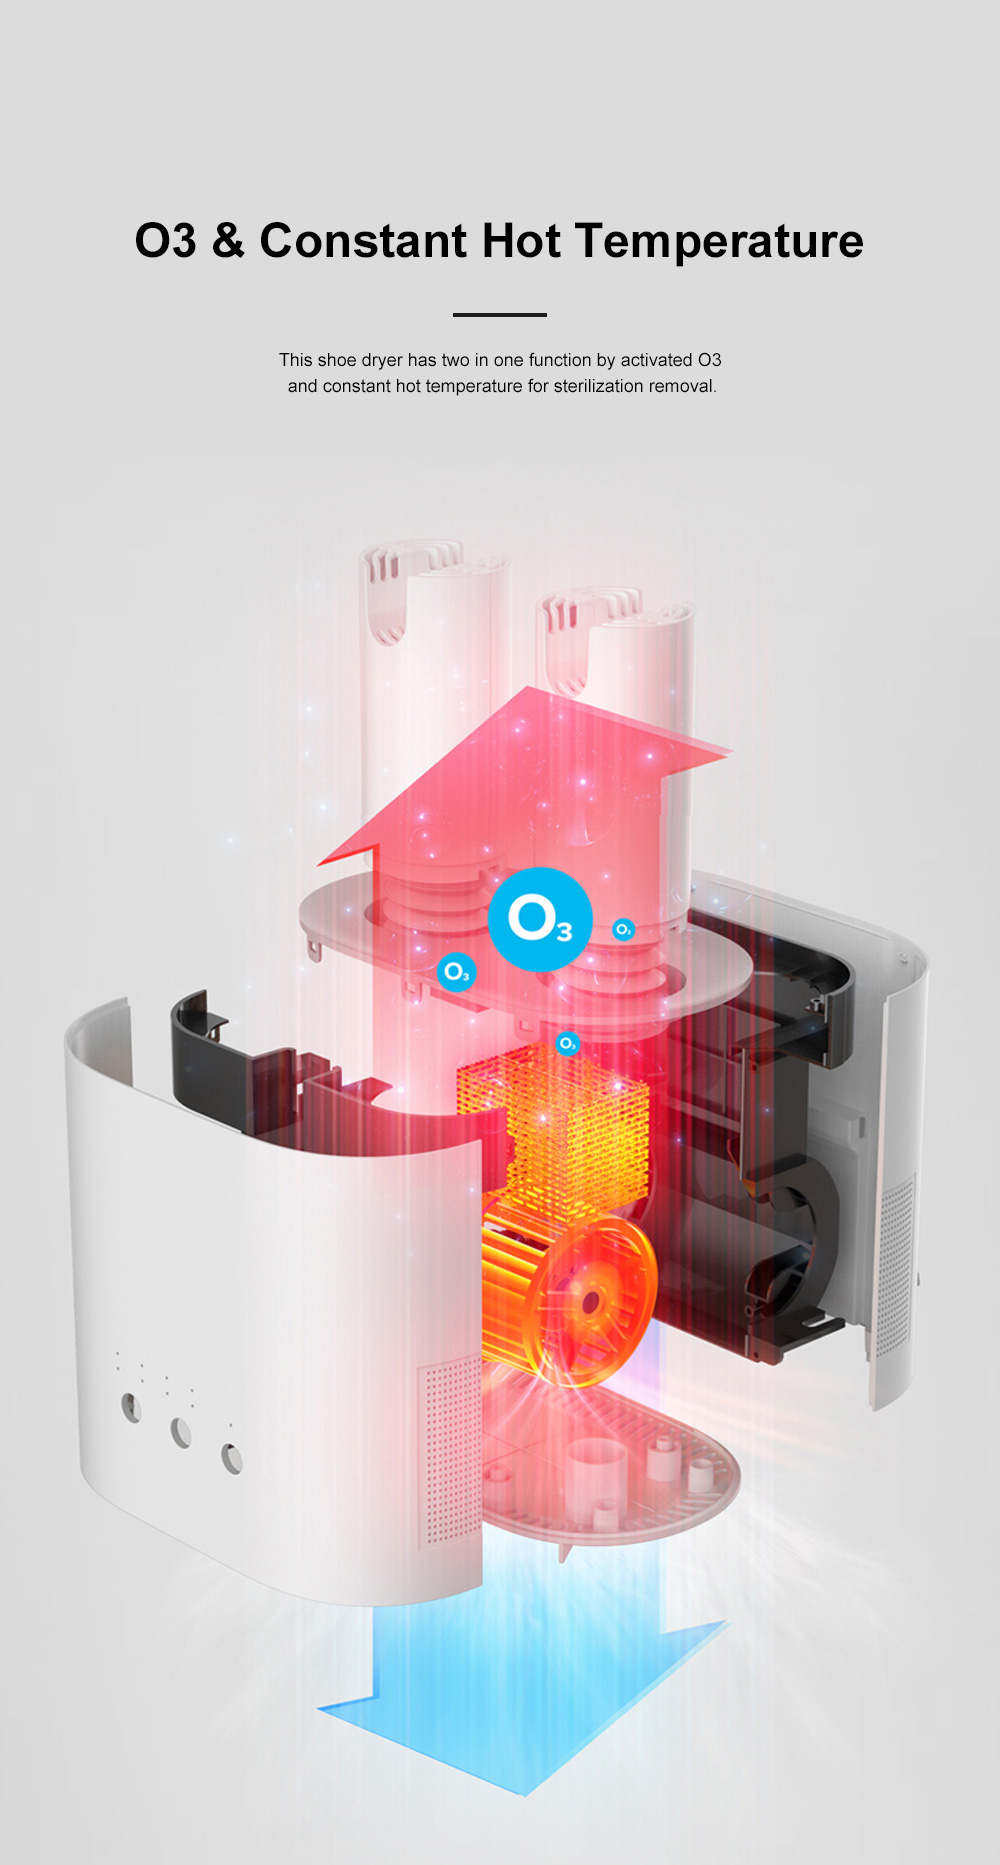 DEERMA Multiple-effect Shoe Dryer for Family Use Deodorizing and Sterilizing Drying Machine Multifunctional Telescopic Shoe Dryer 4